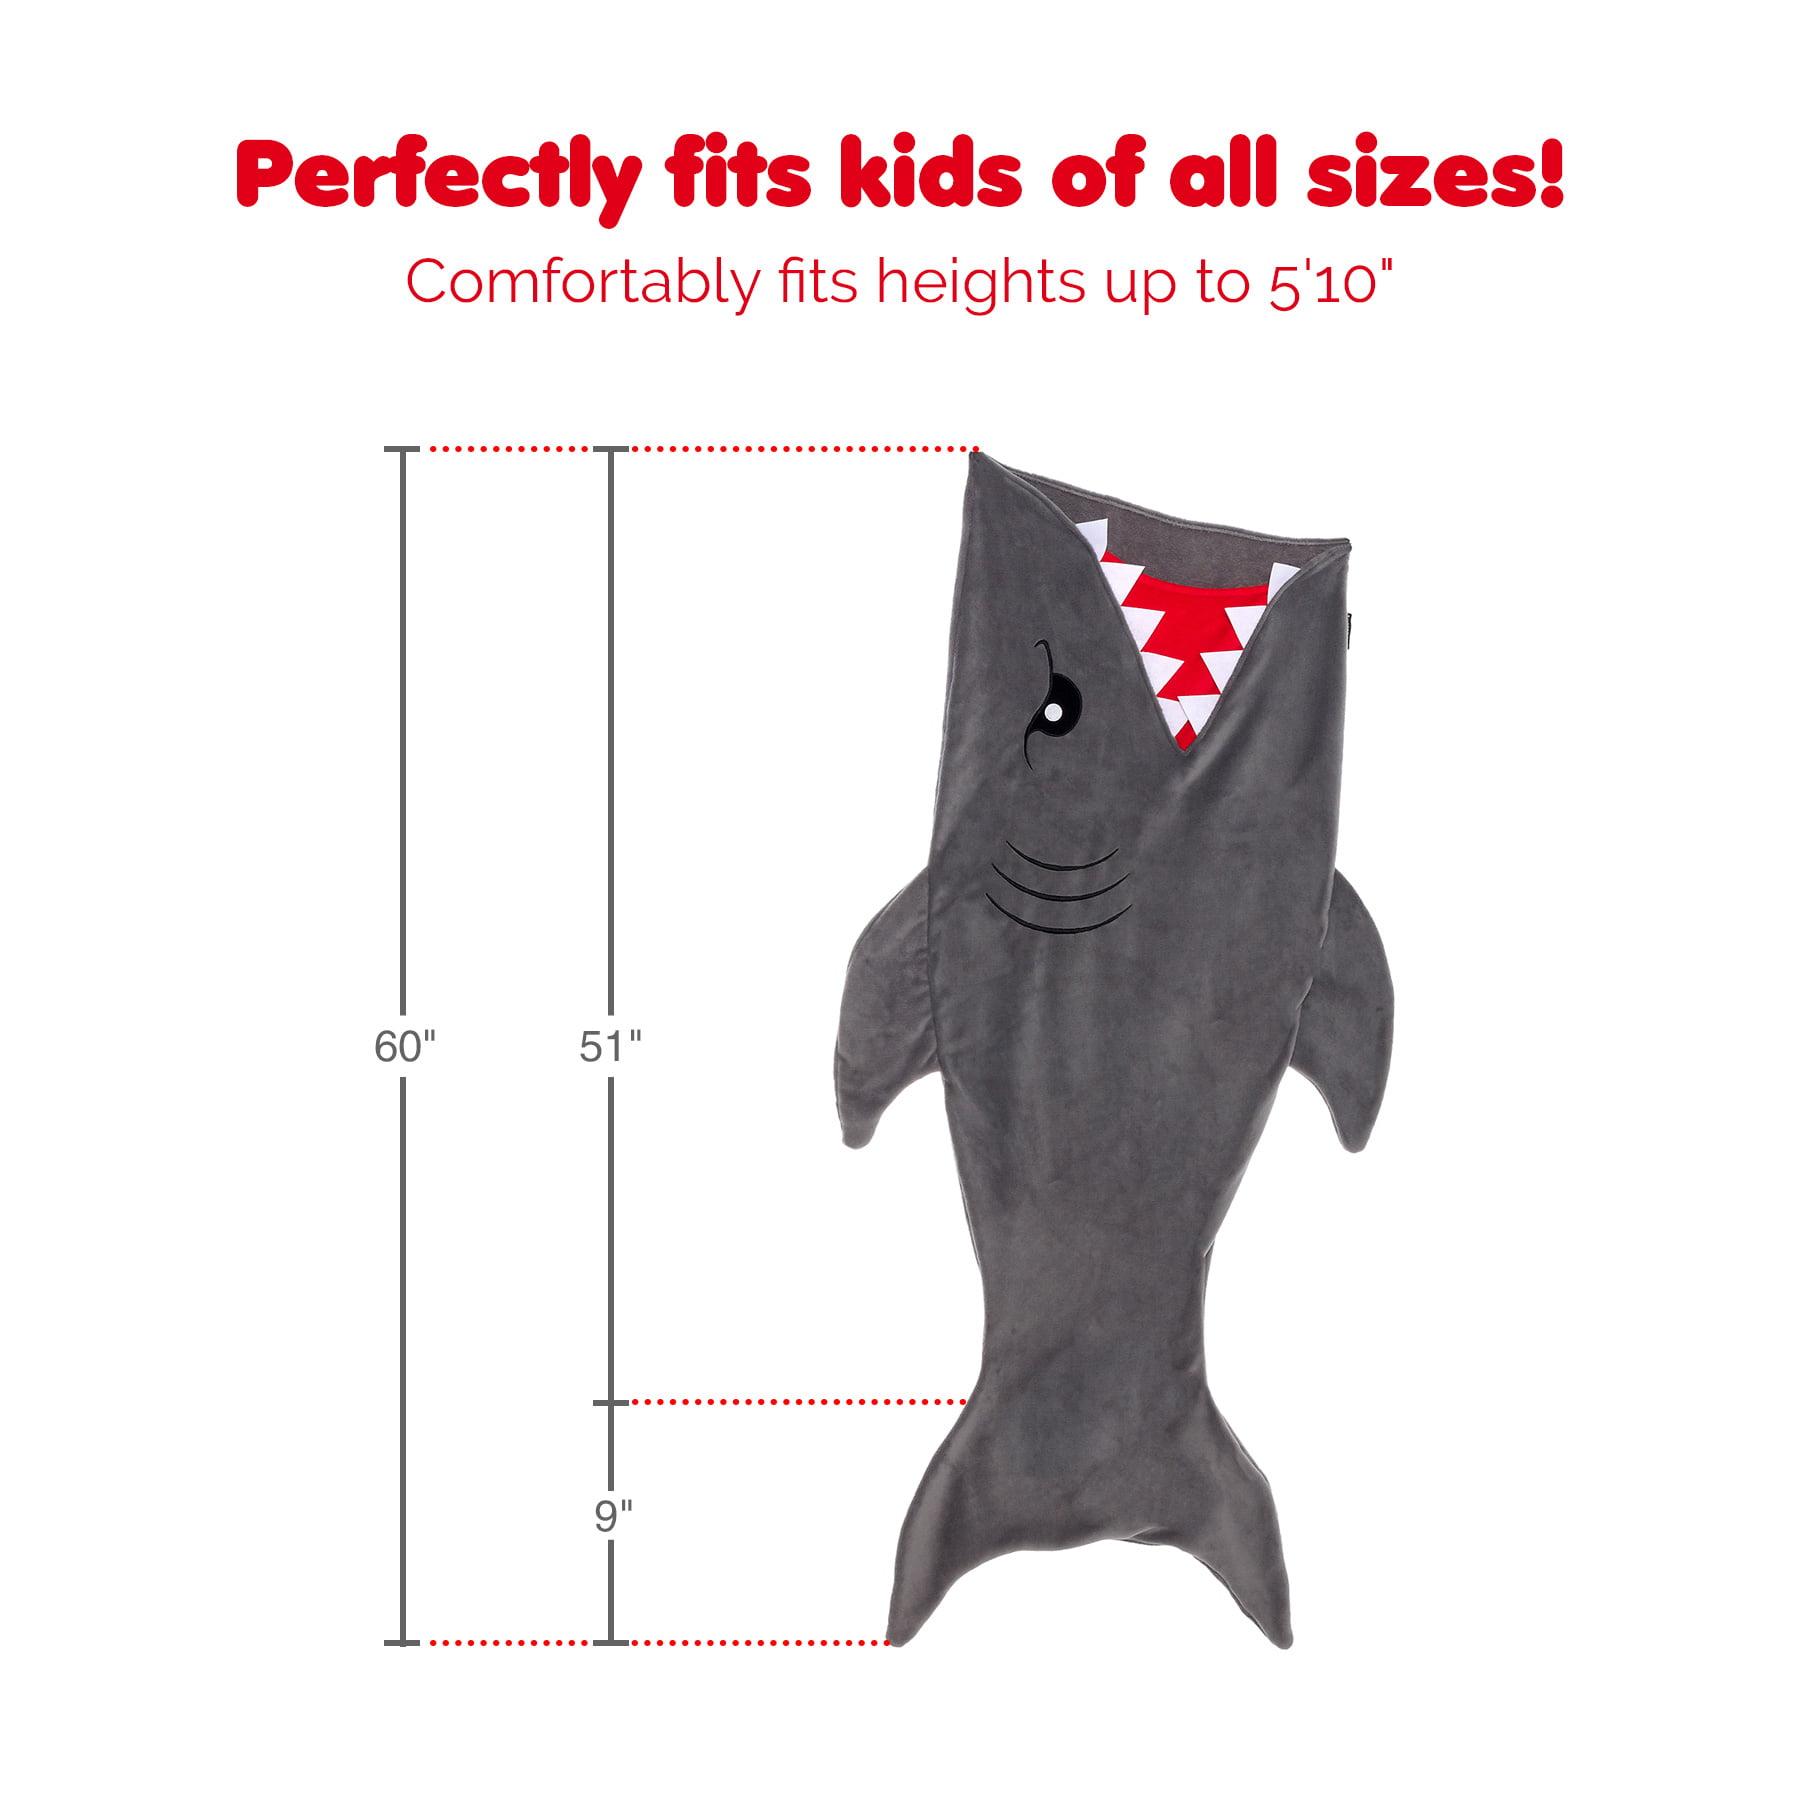 timeless design 9ac18 216d0 Silver Lilly Gray Shark Tail Plush Animal Sleeping Bag Novelty Blanket for  Kids